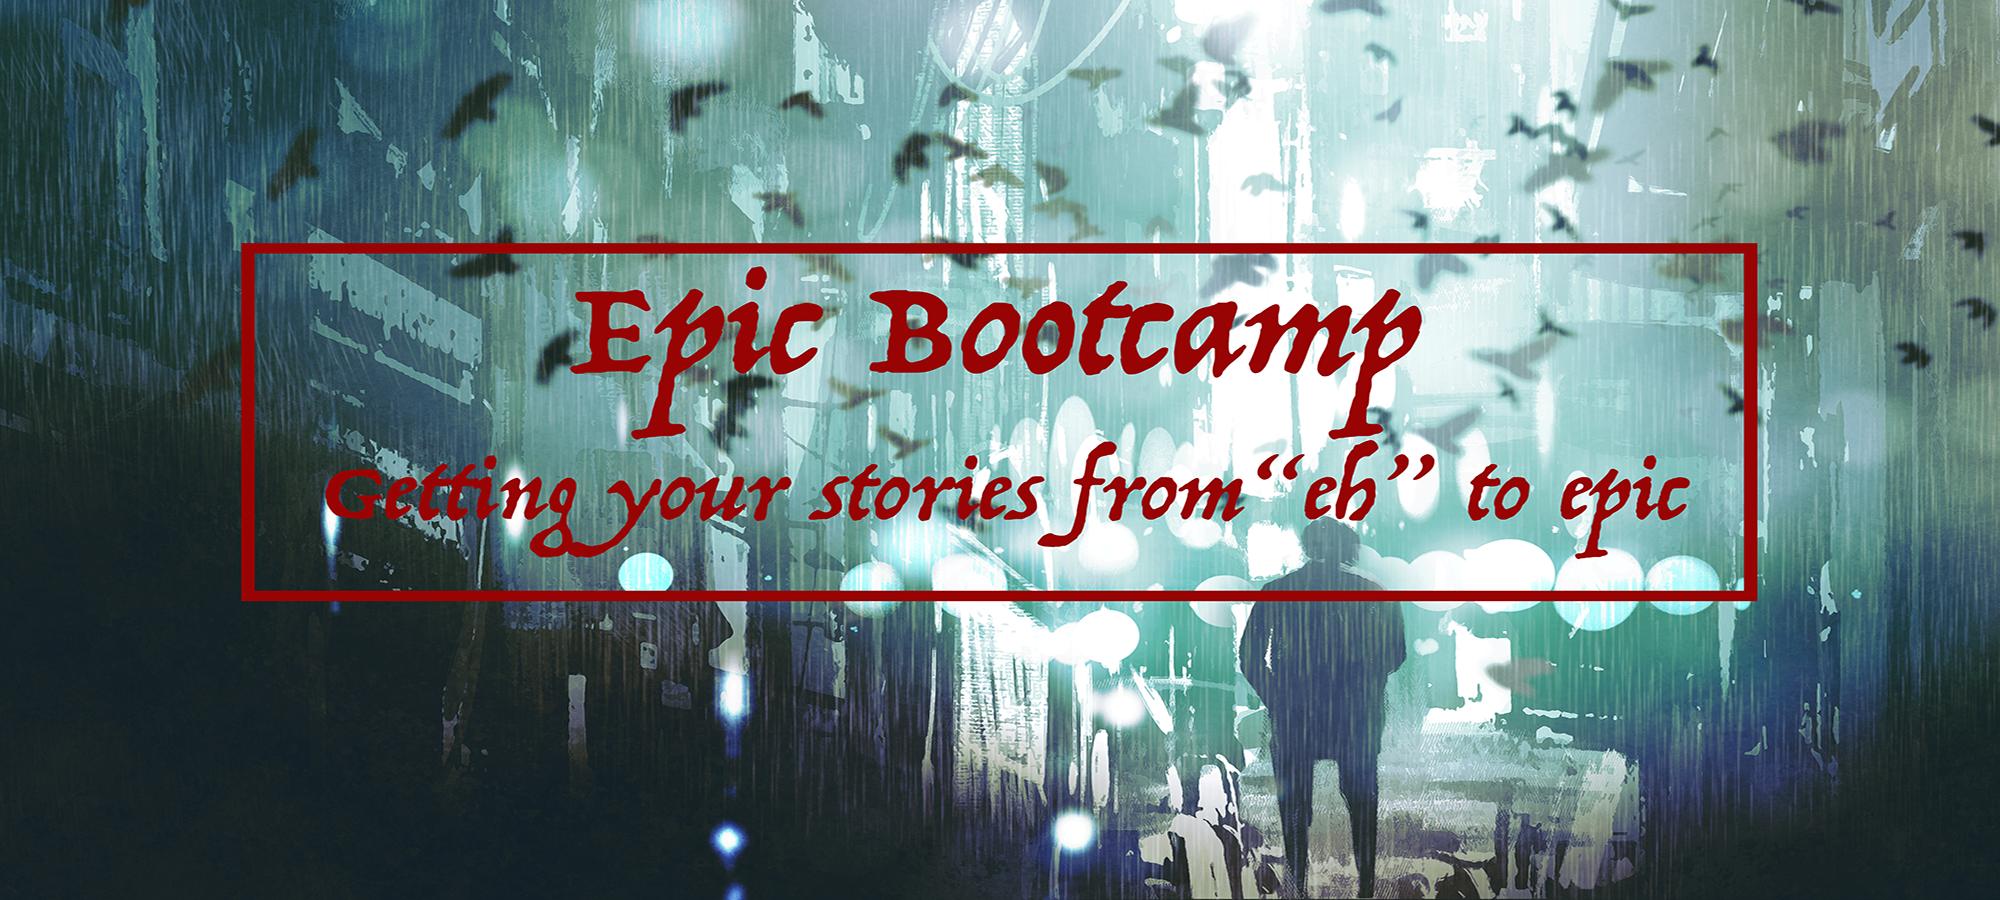 Epic Bootcamp_header_smaller